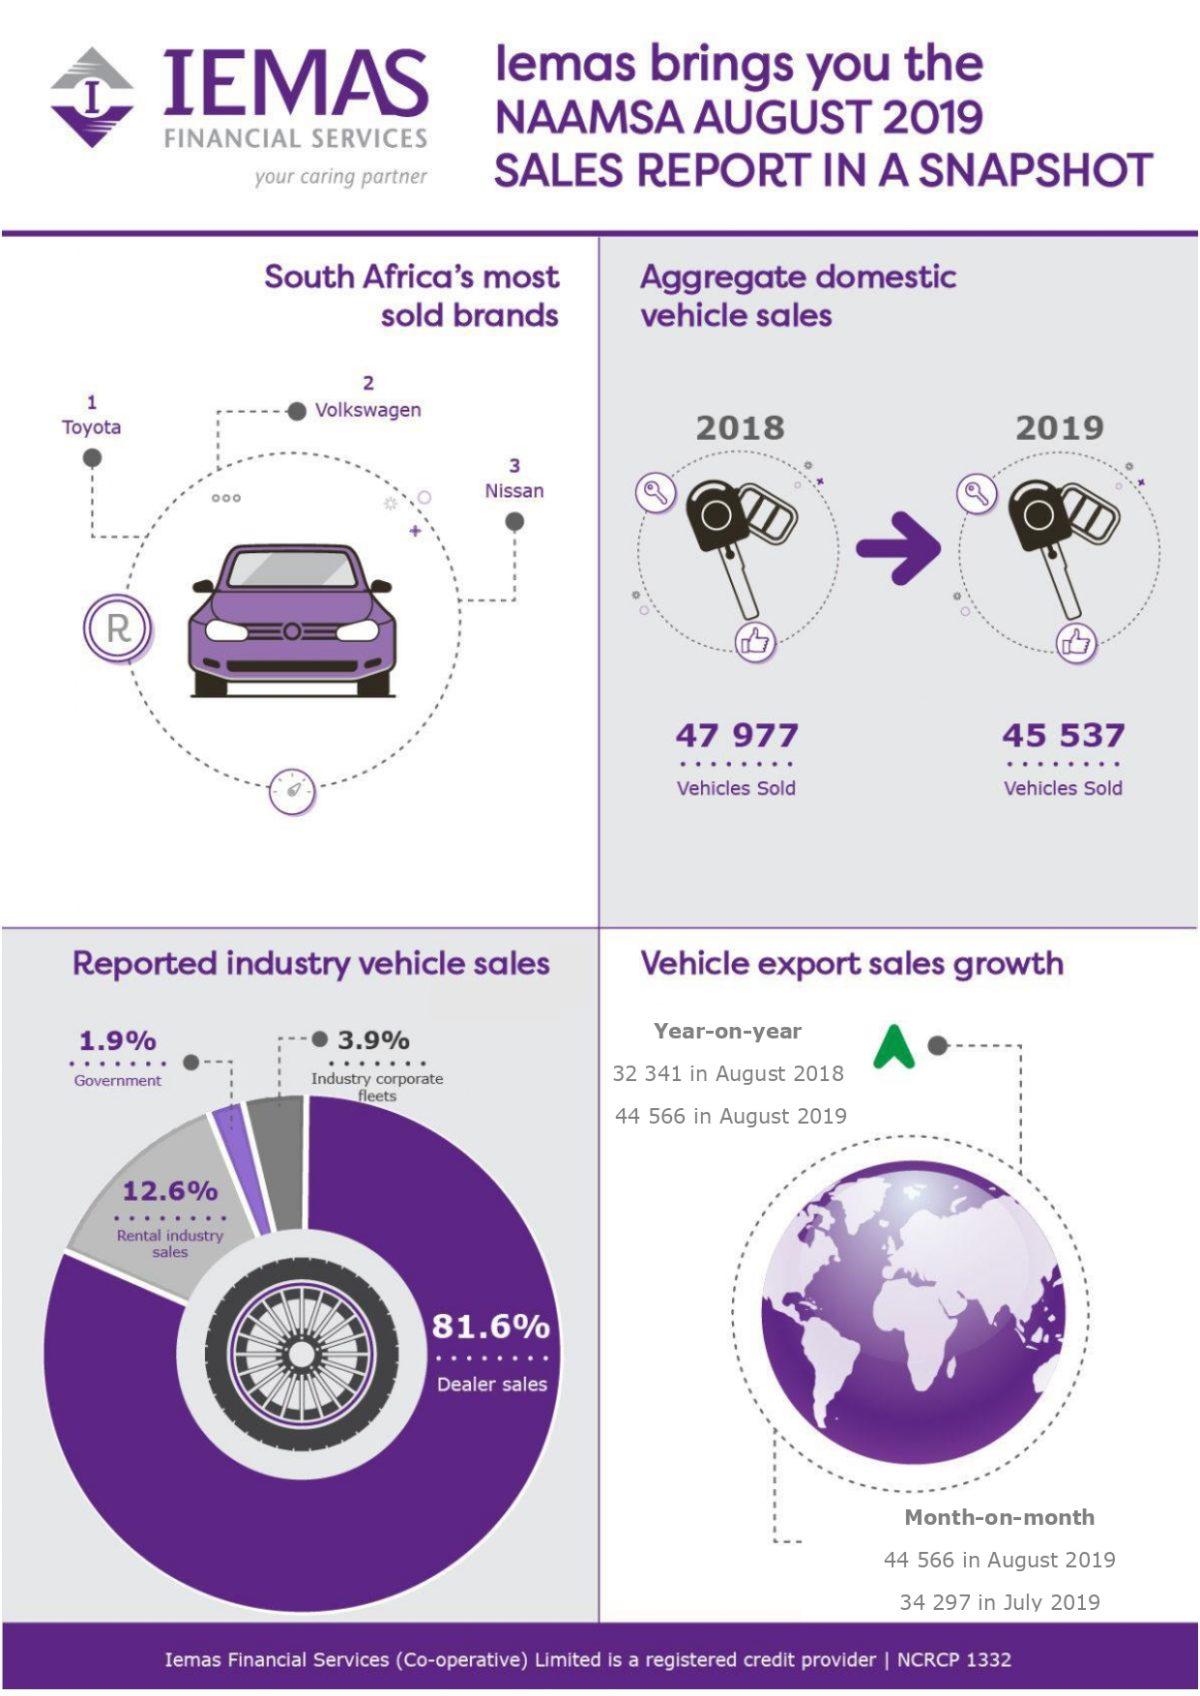 NAAMSA new vehicle sales and exports report